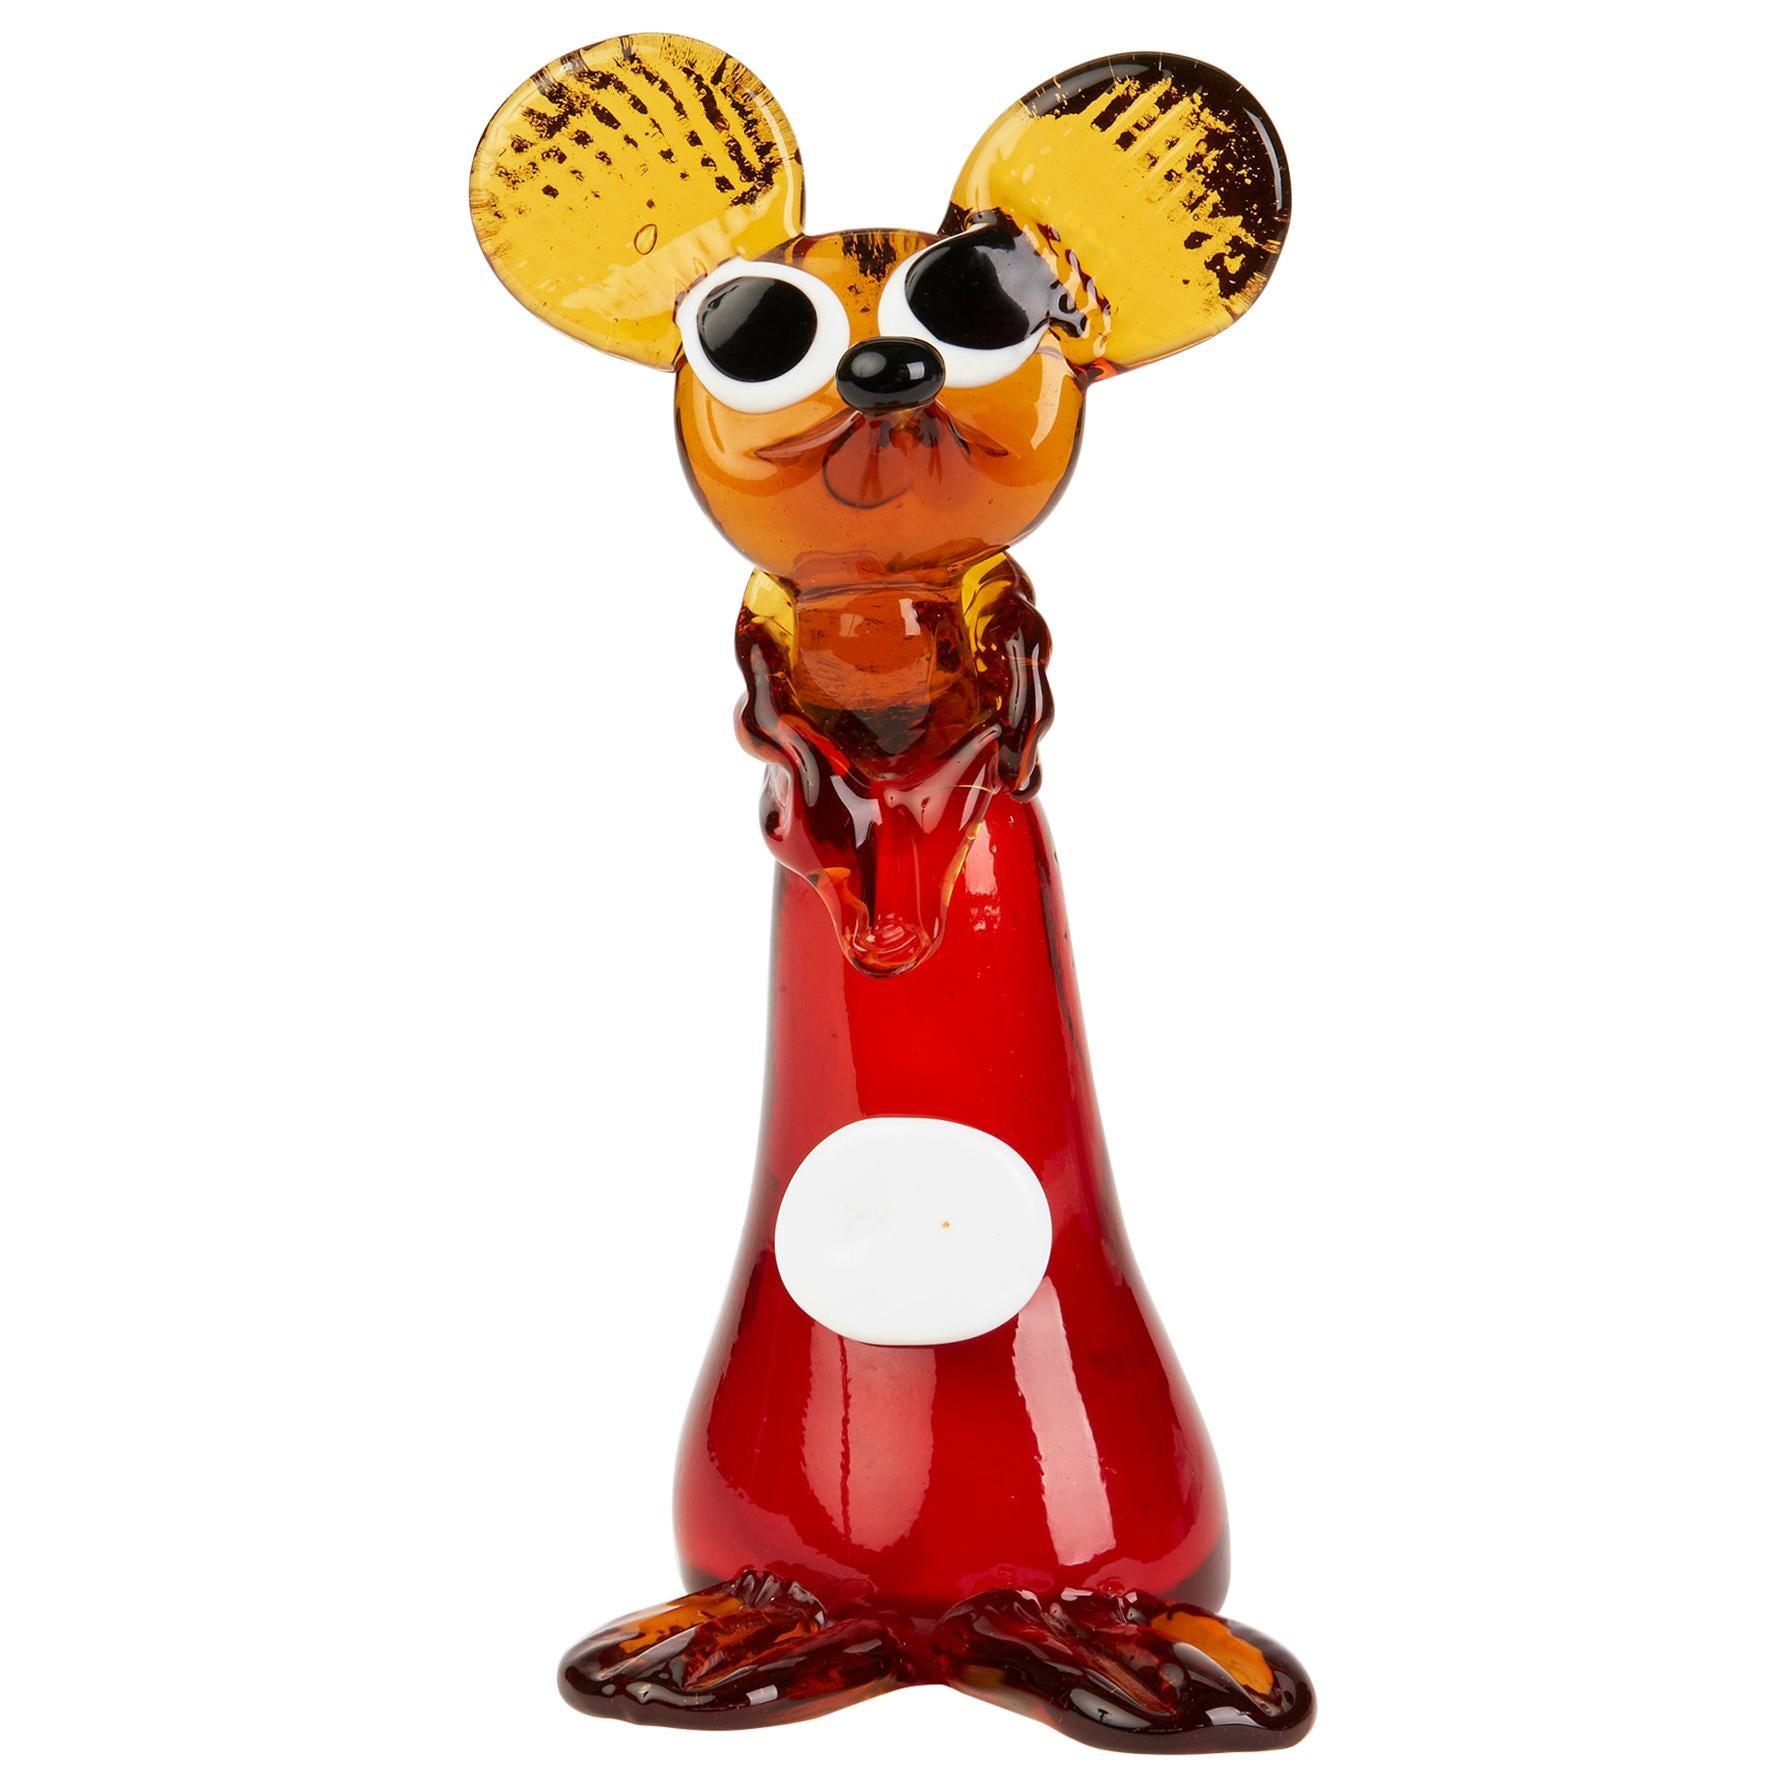 Murano Venetian Vintage Glass Mouse Figure, 1950s-1960s